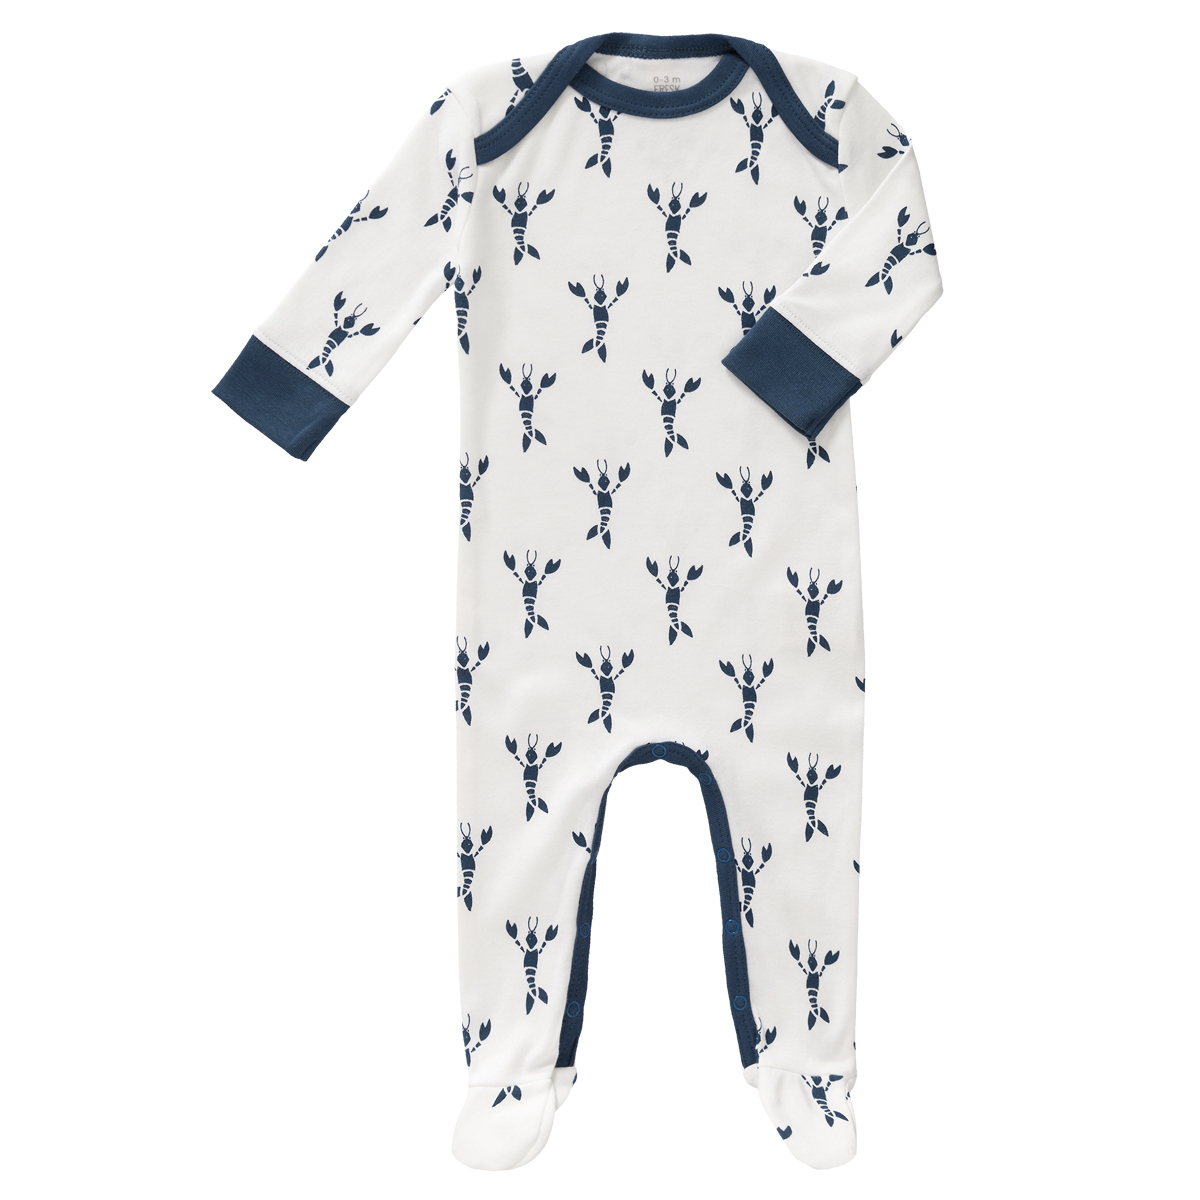 Body & Pyjama Pyjama Crabe - 0/3 Mois Pyjama Crabe - 0/3 Mois